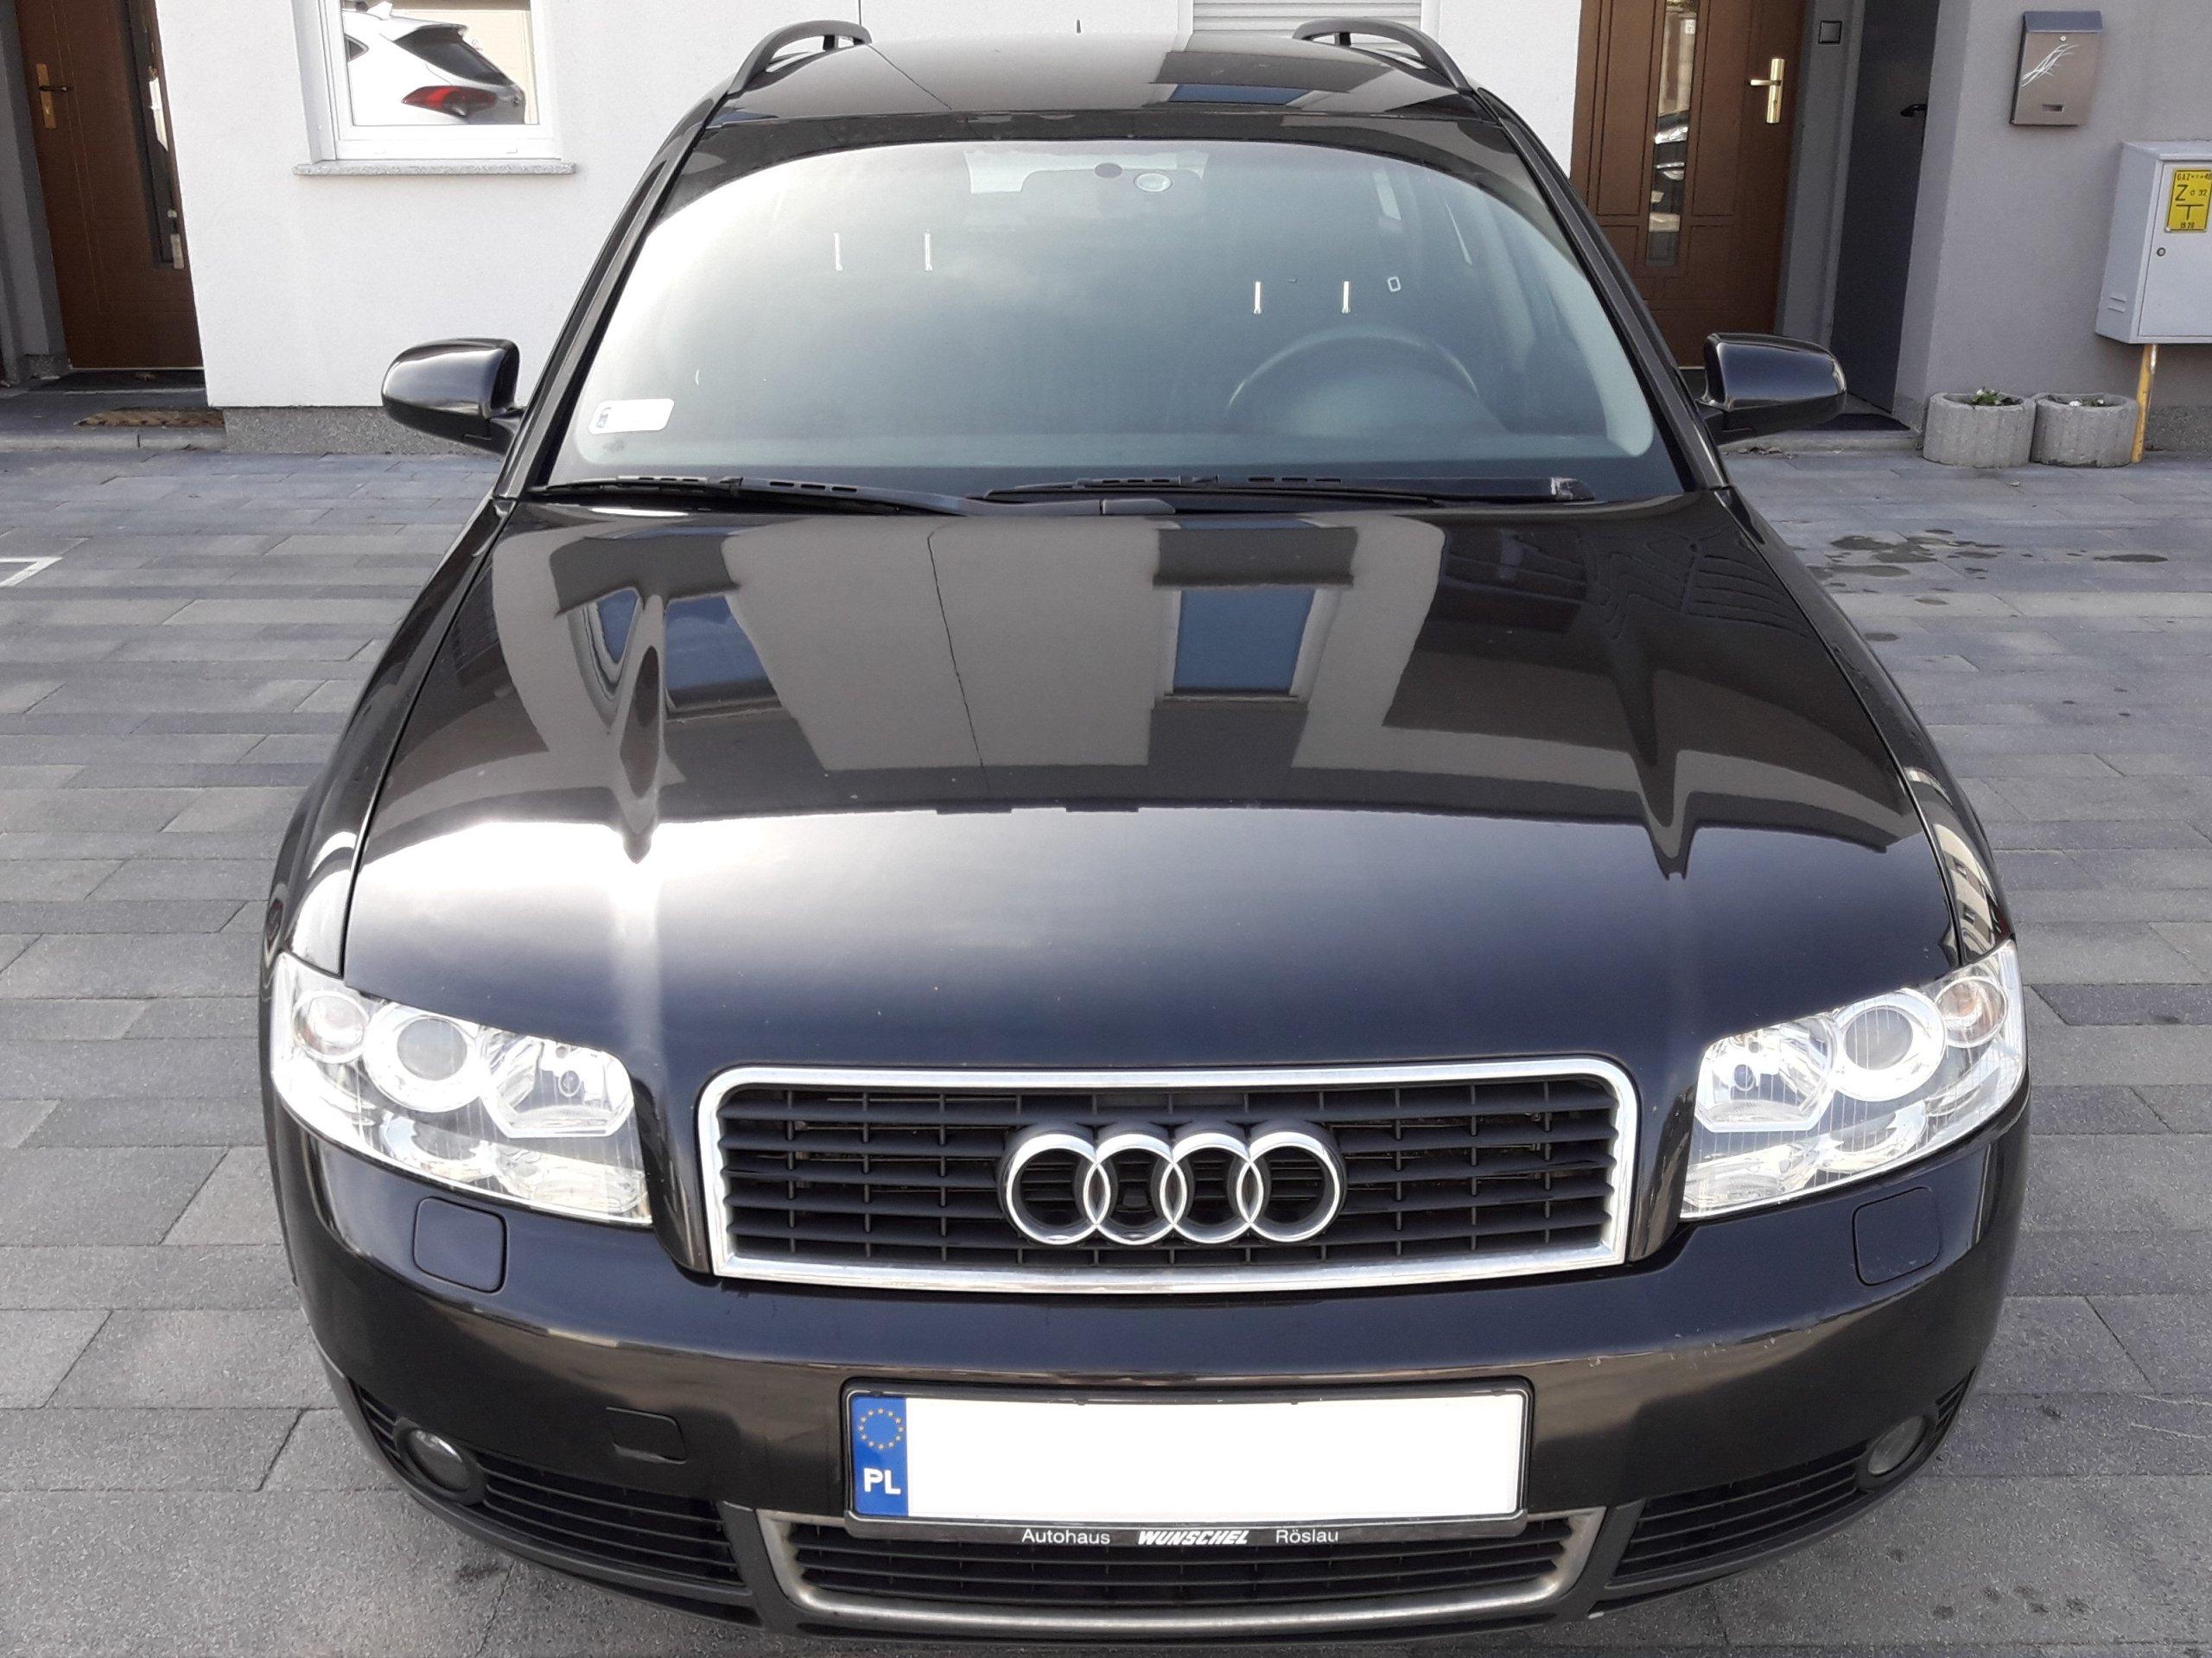 Audi A4 B6 Avant 18 T Lpg 163 Km 2003 R 7273425713